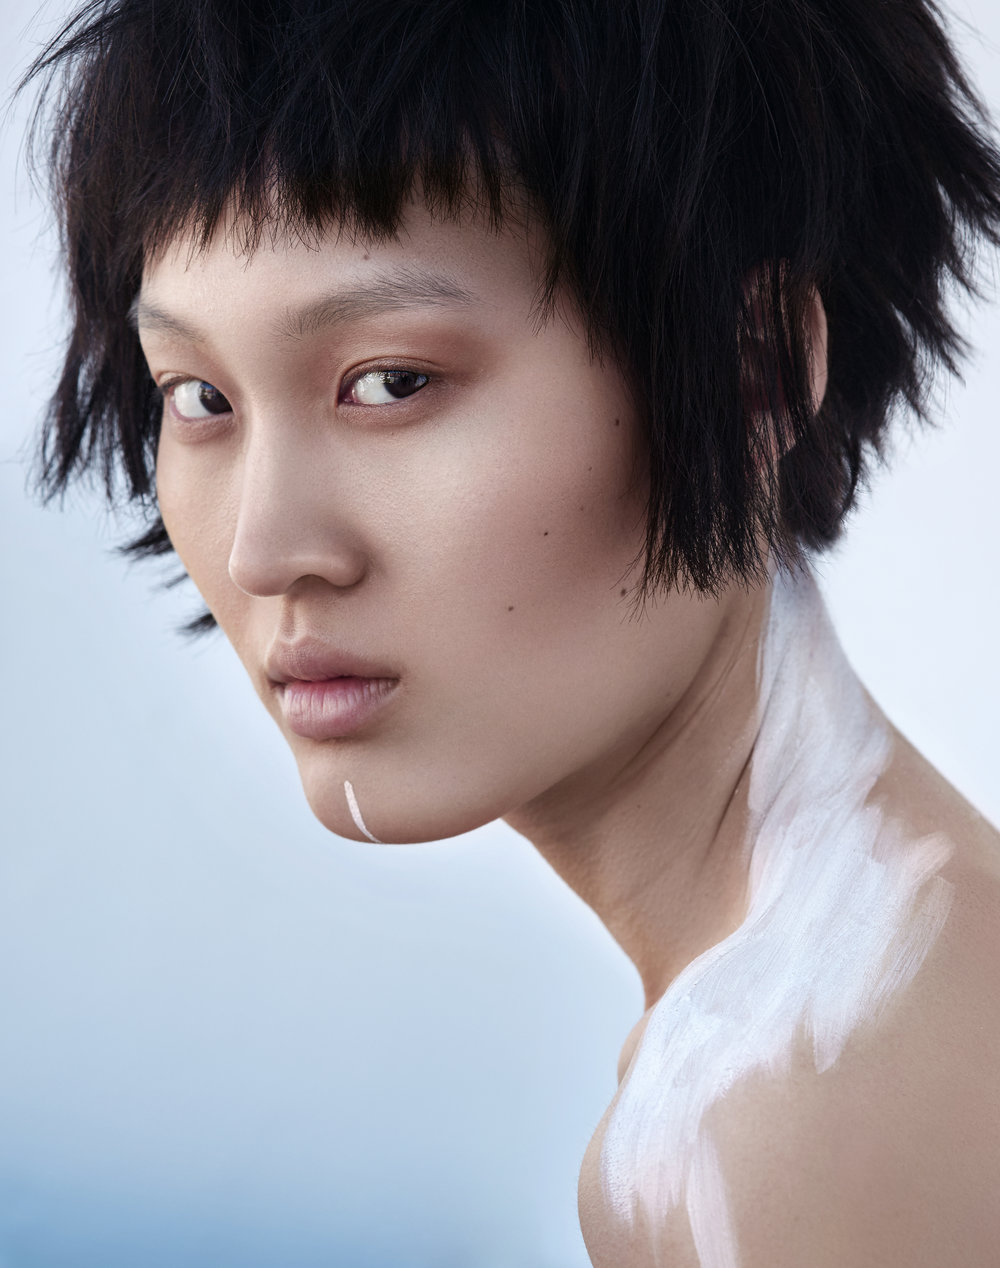 Anna Dabrowska beauty 023.jpg